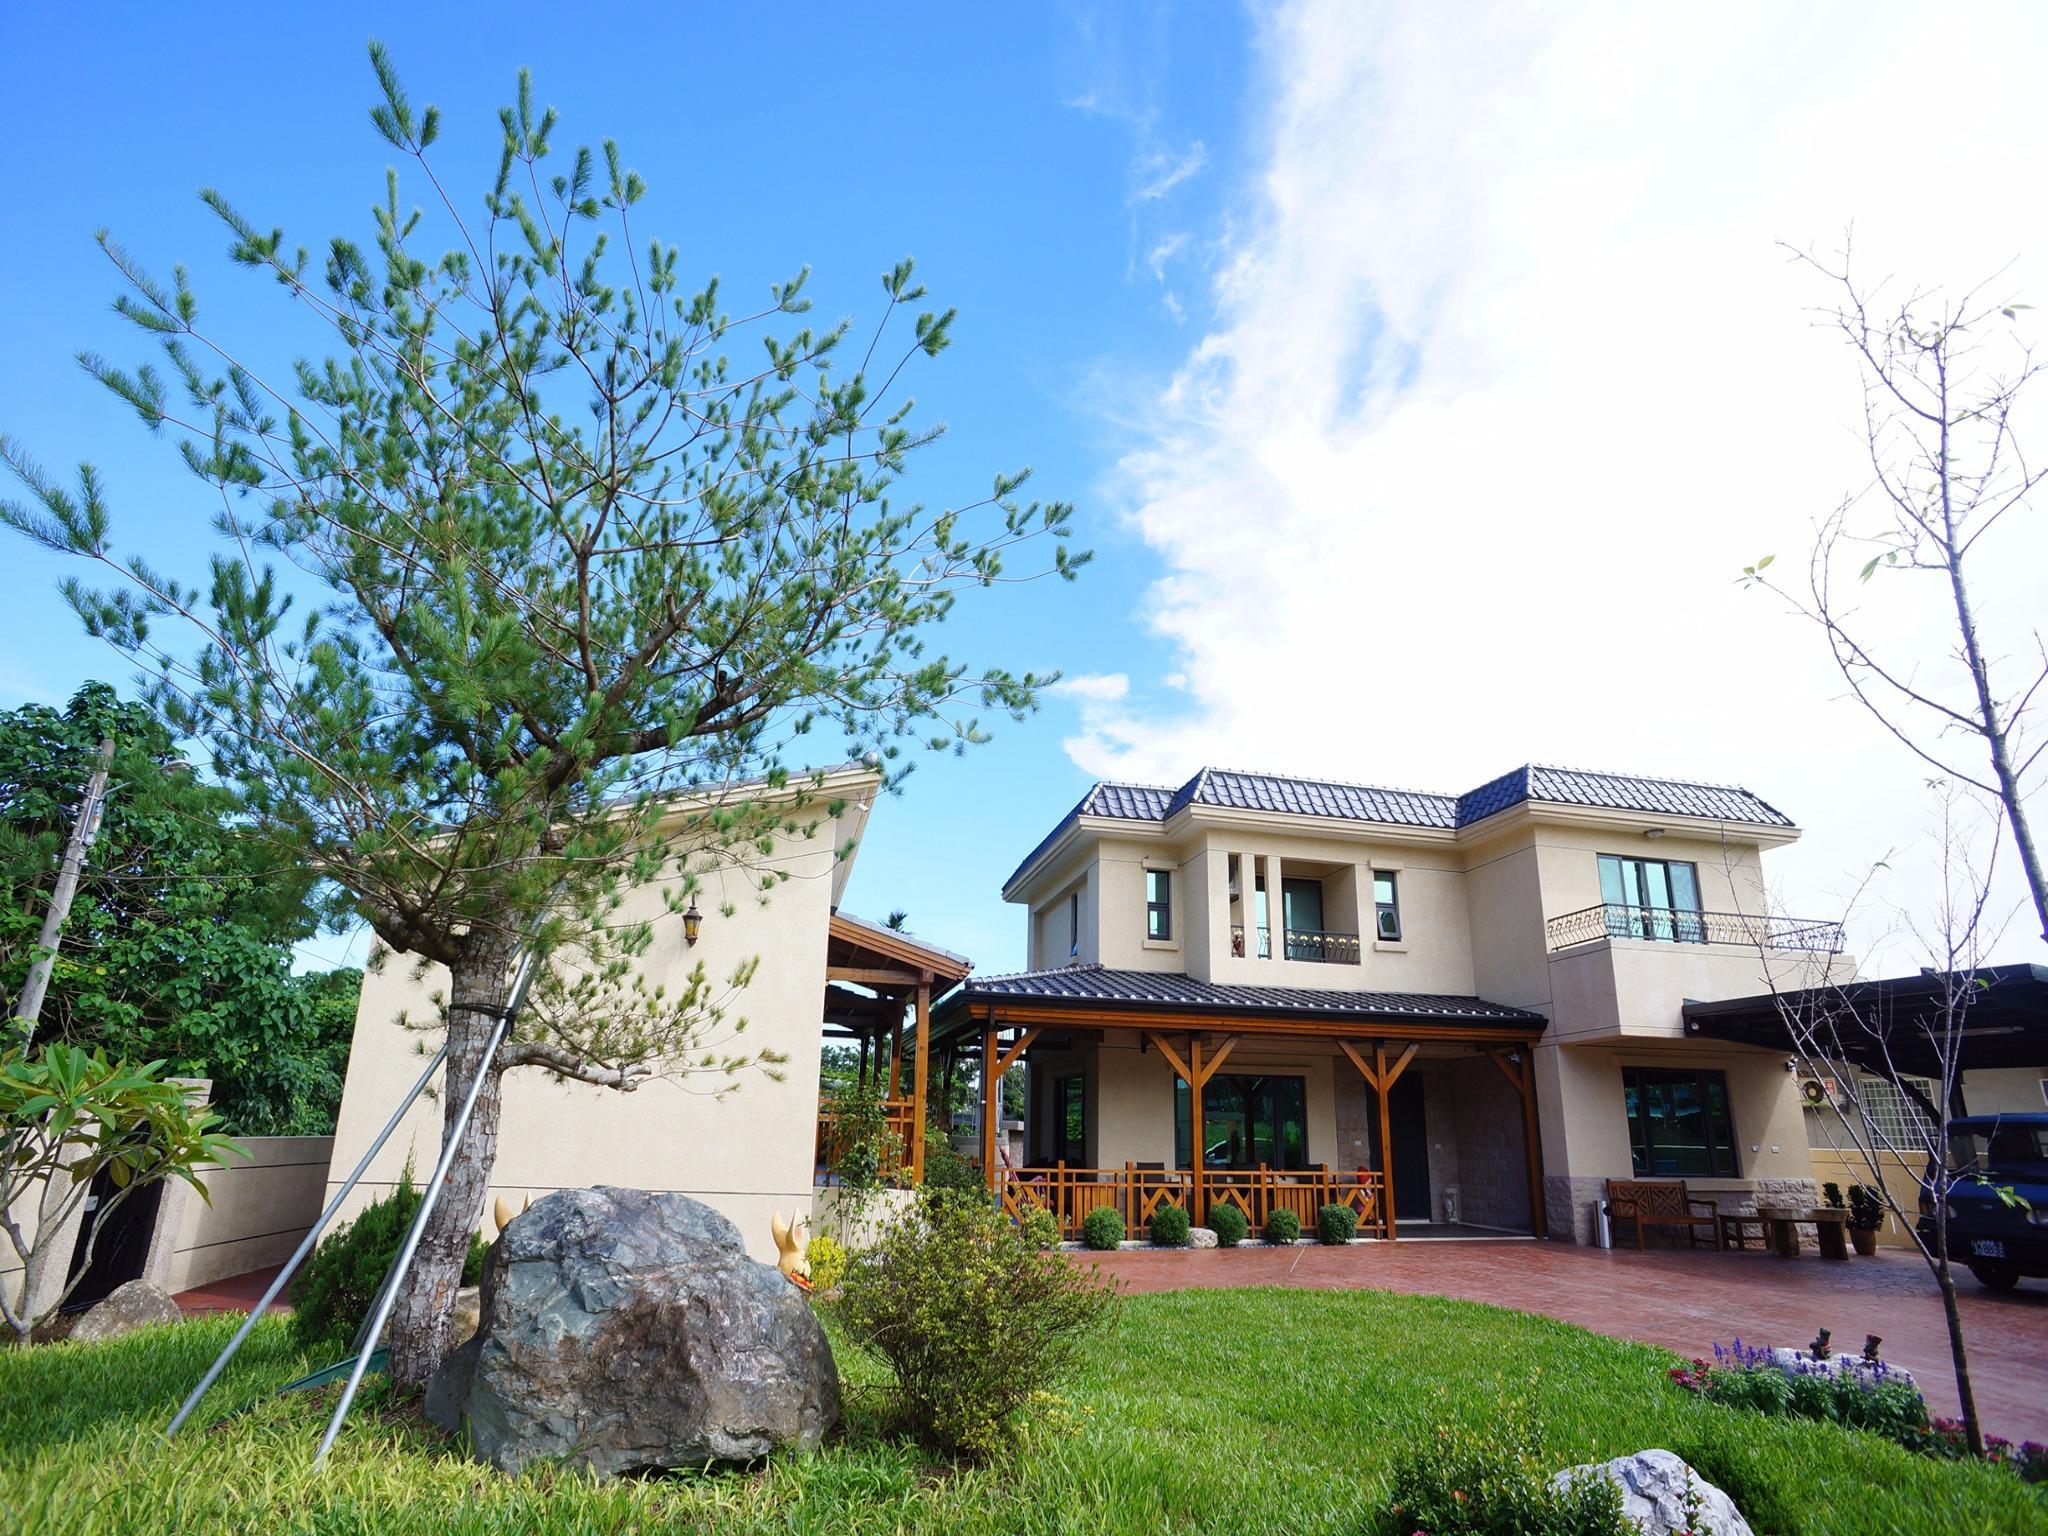 Yitongjin Homestay